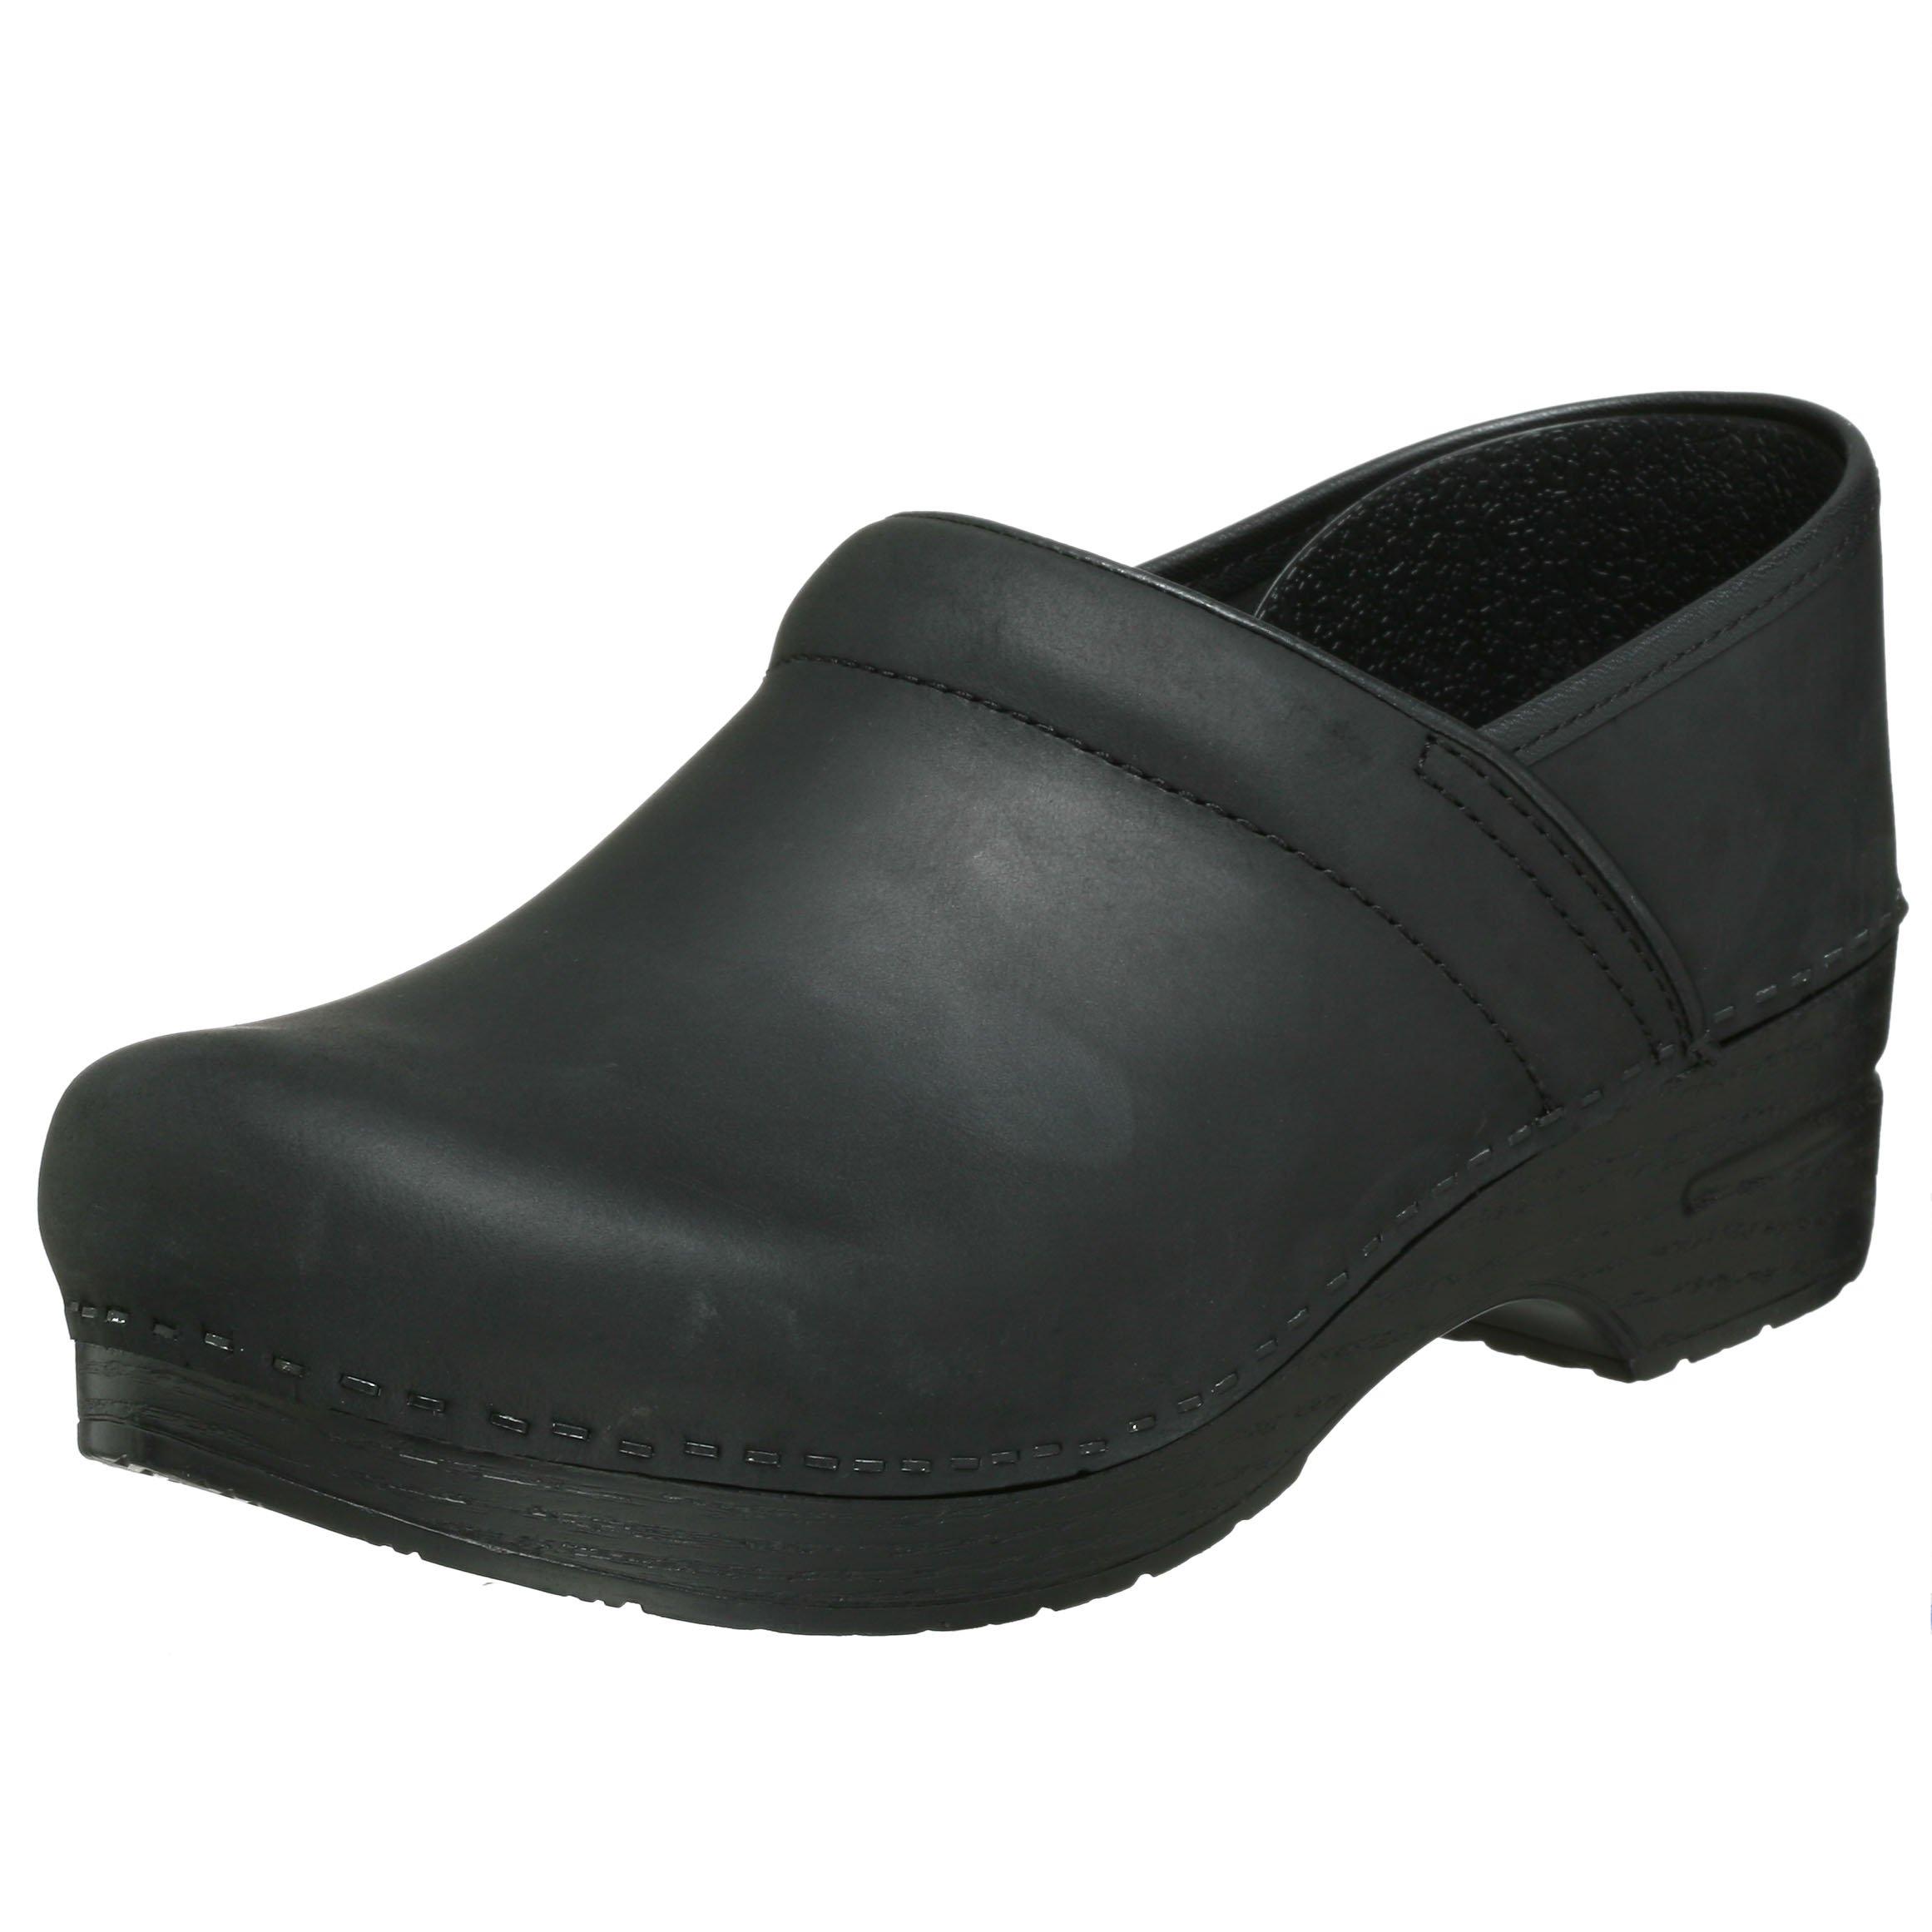 Dansko Professional Leather, Black 48 (US Men's 14.5-15) Regular